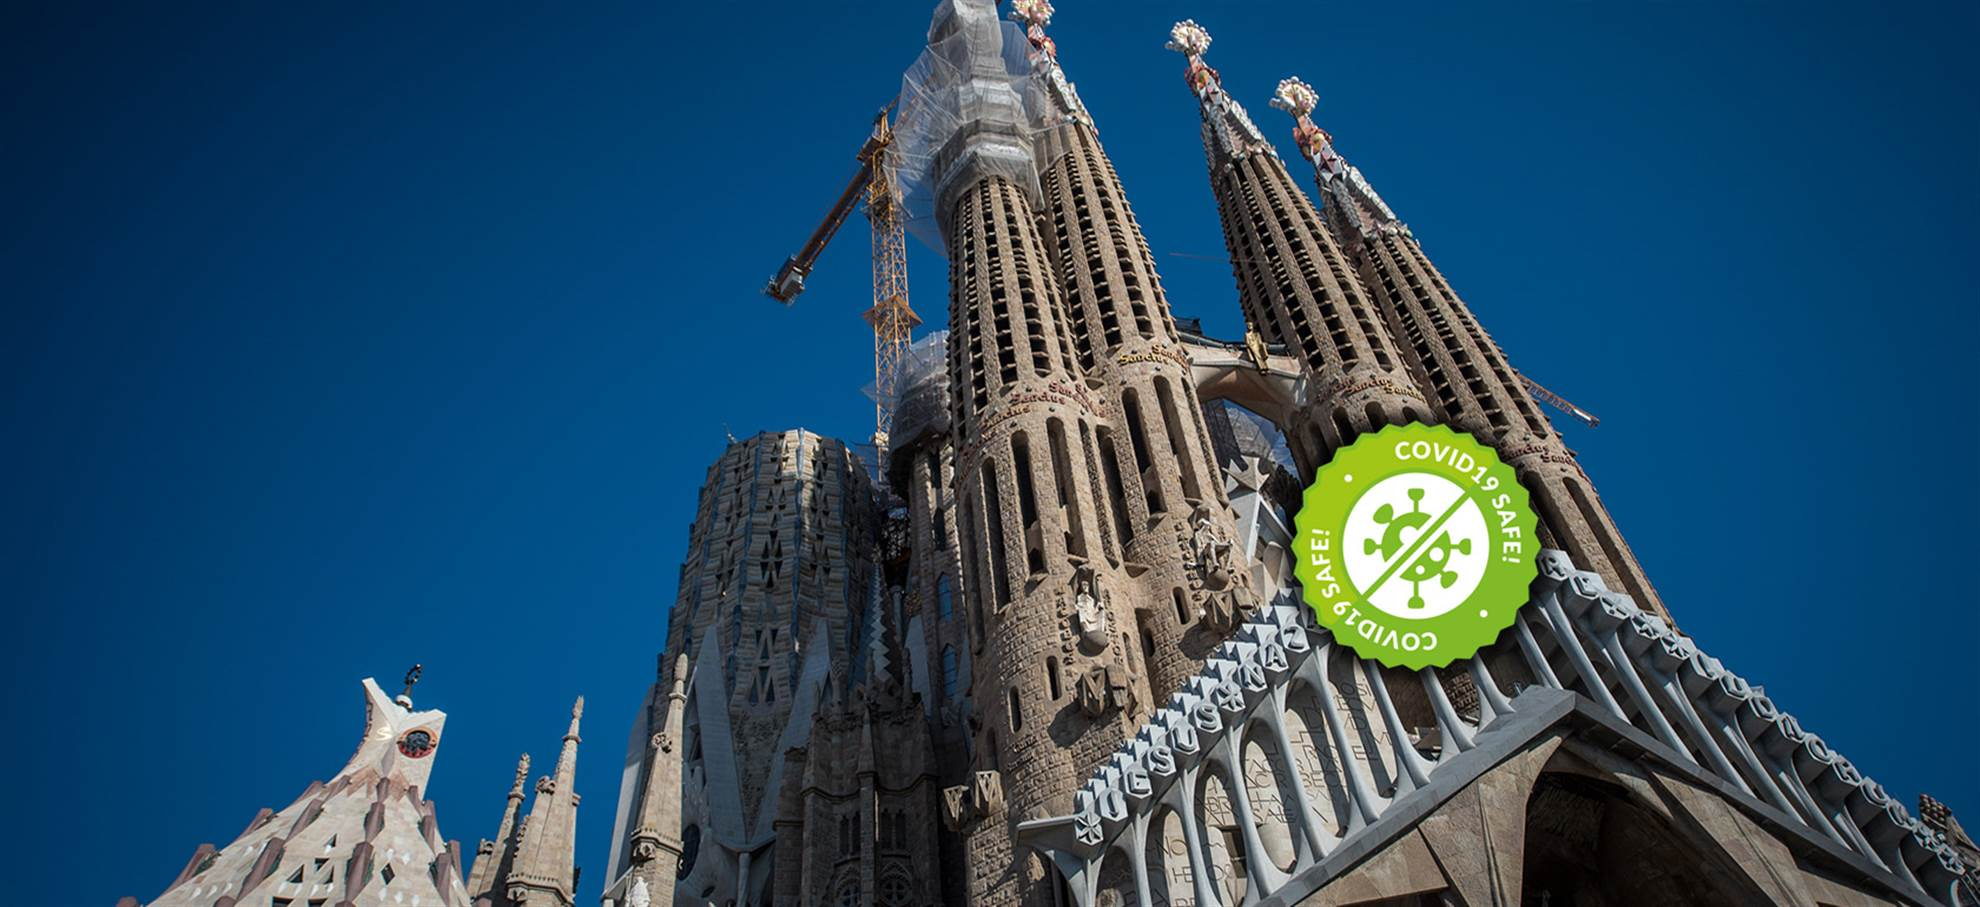 La Sagrada Familia 'The Facades Tour'